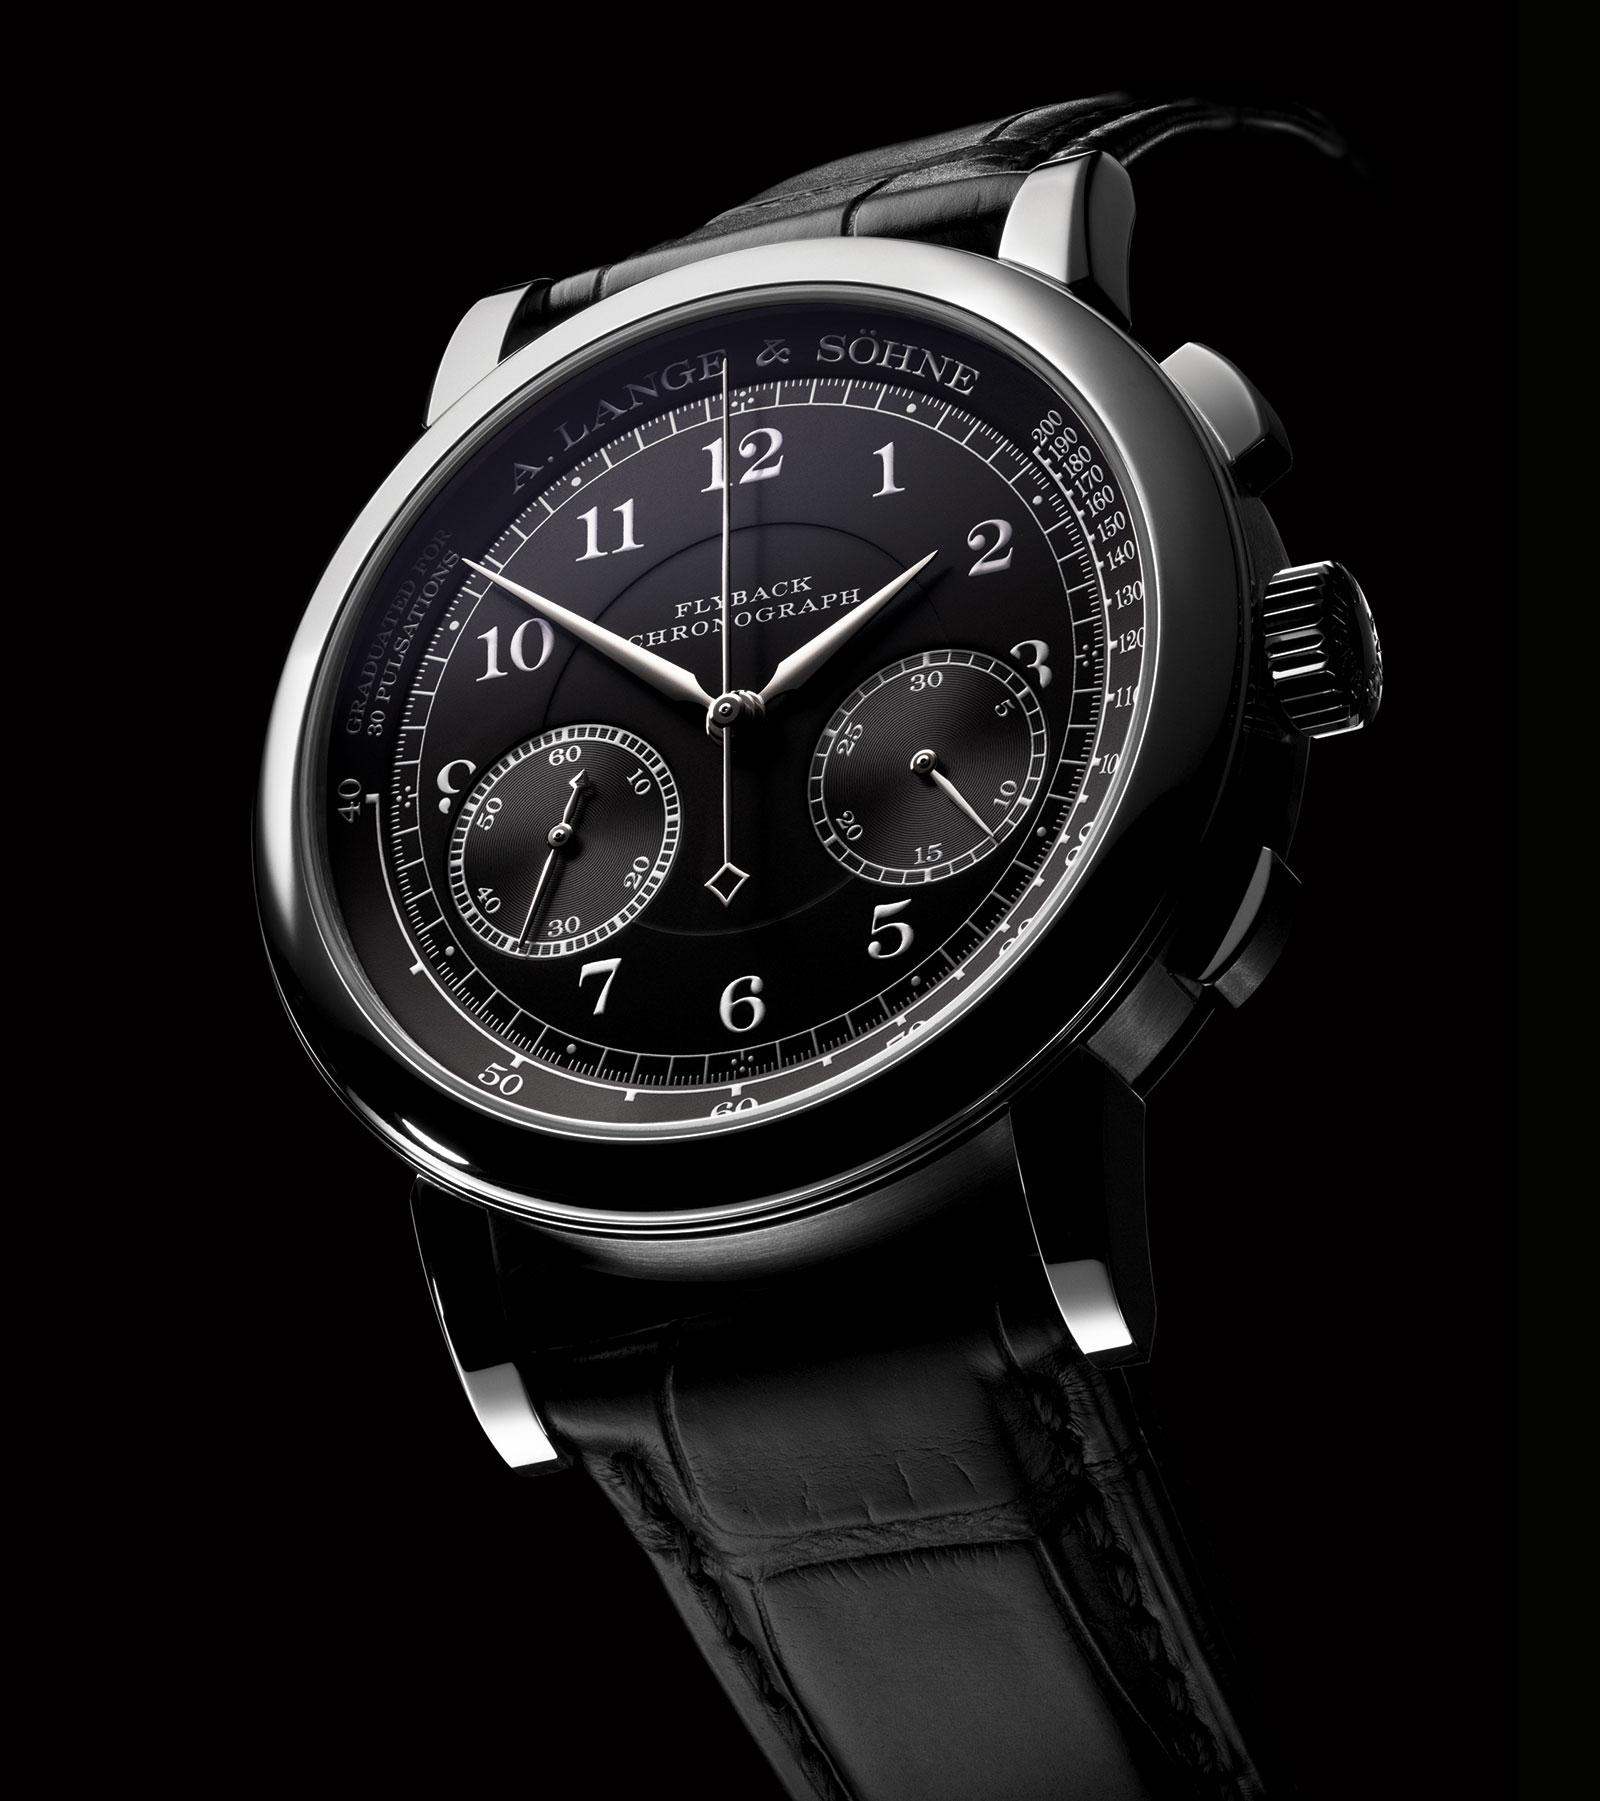 A-Lange-Sohne-1815-Chronograph-Black-2.jpg